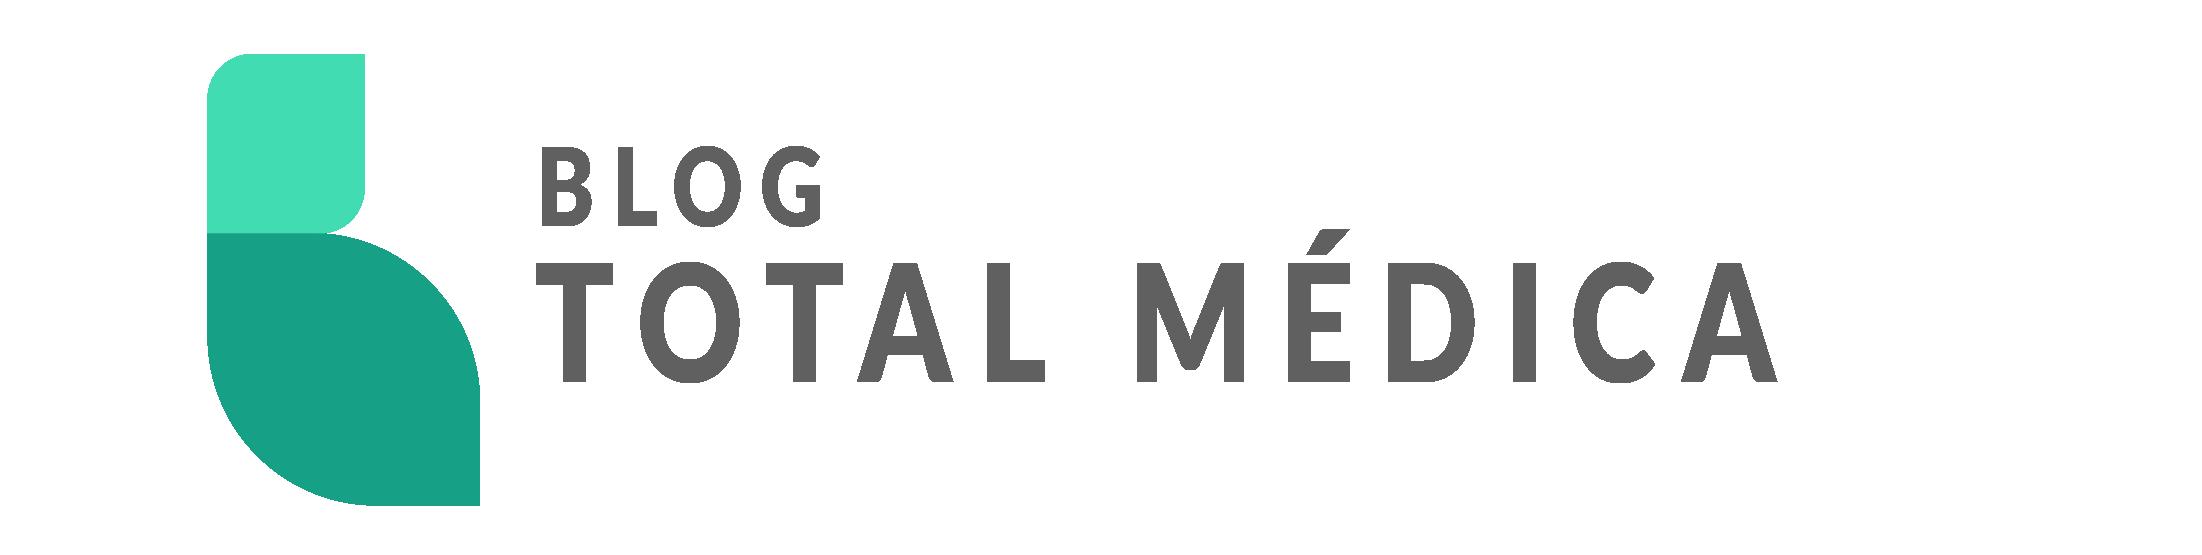 Blog Total Médica